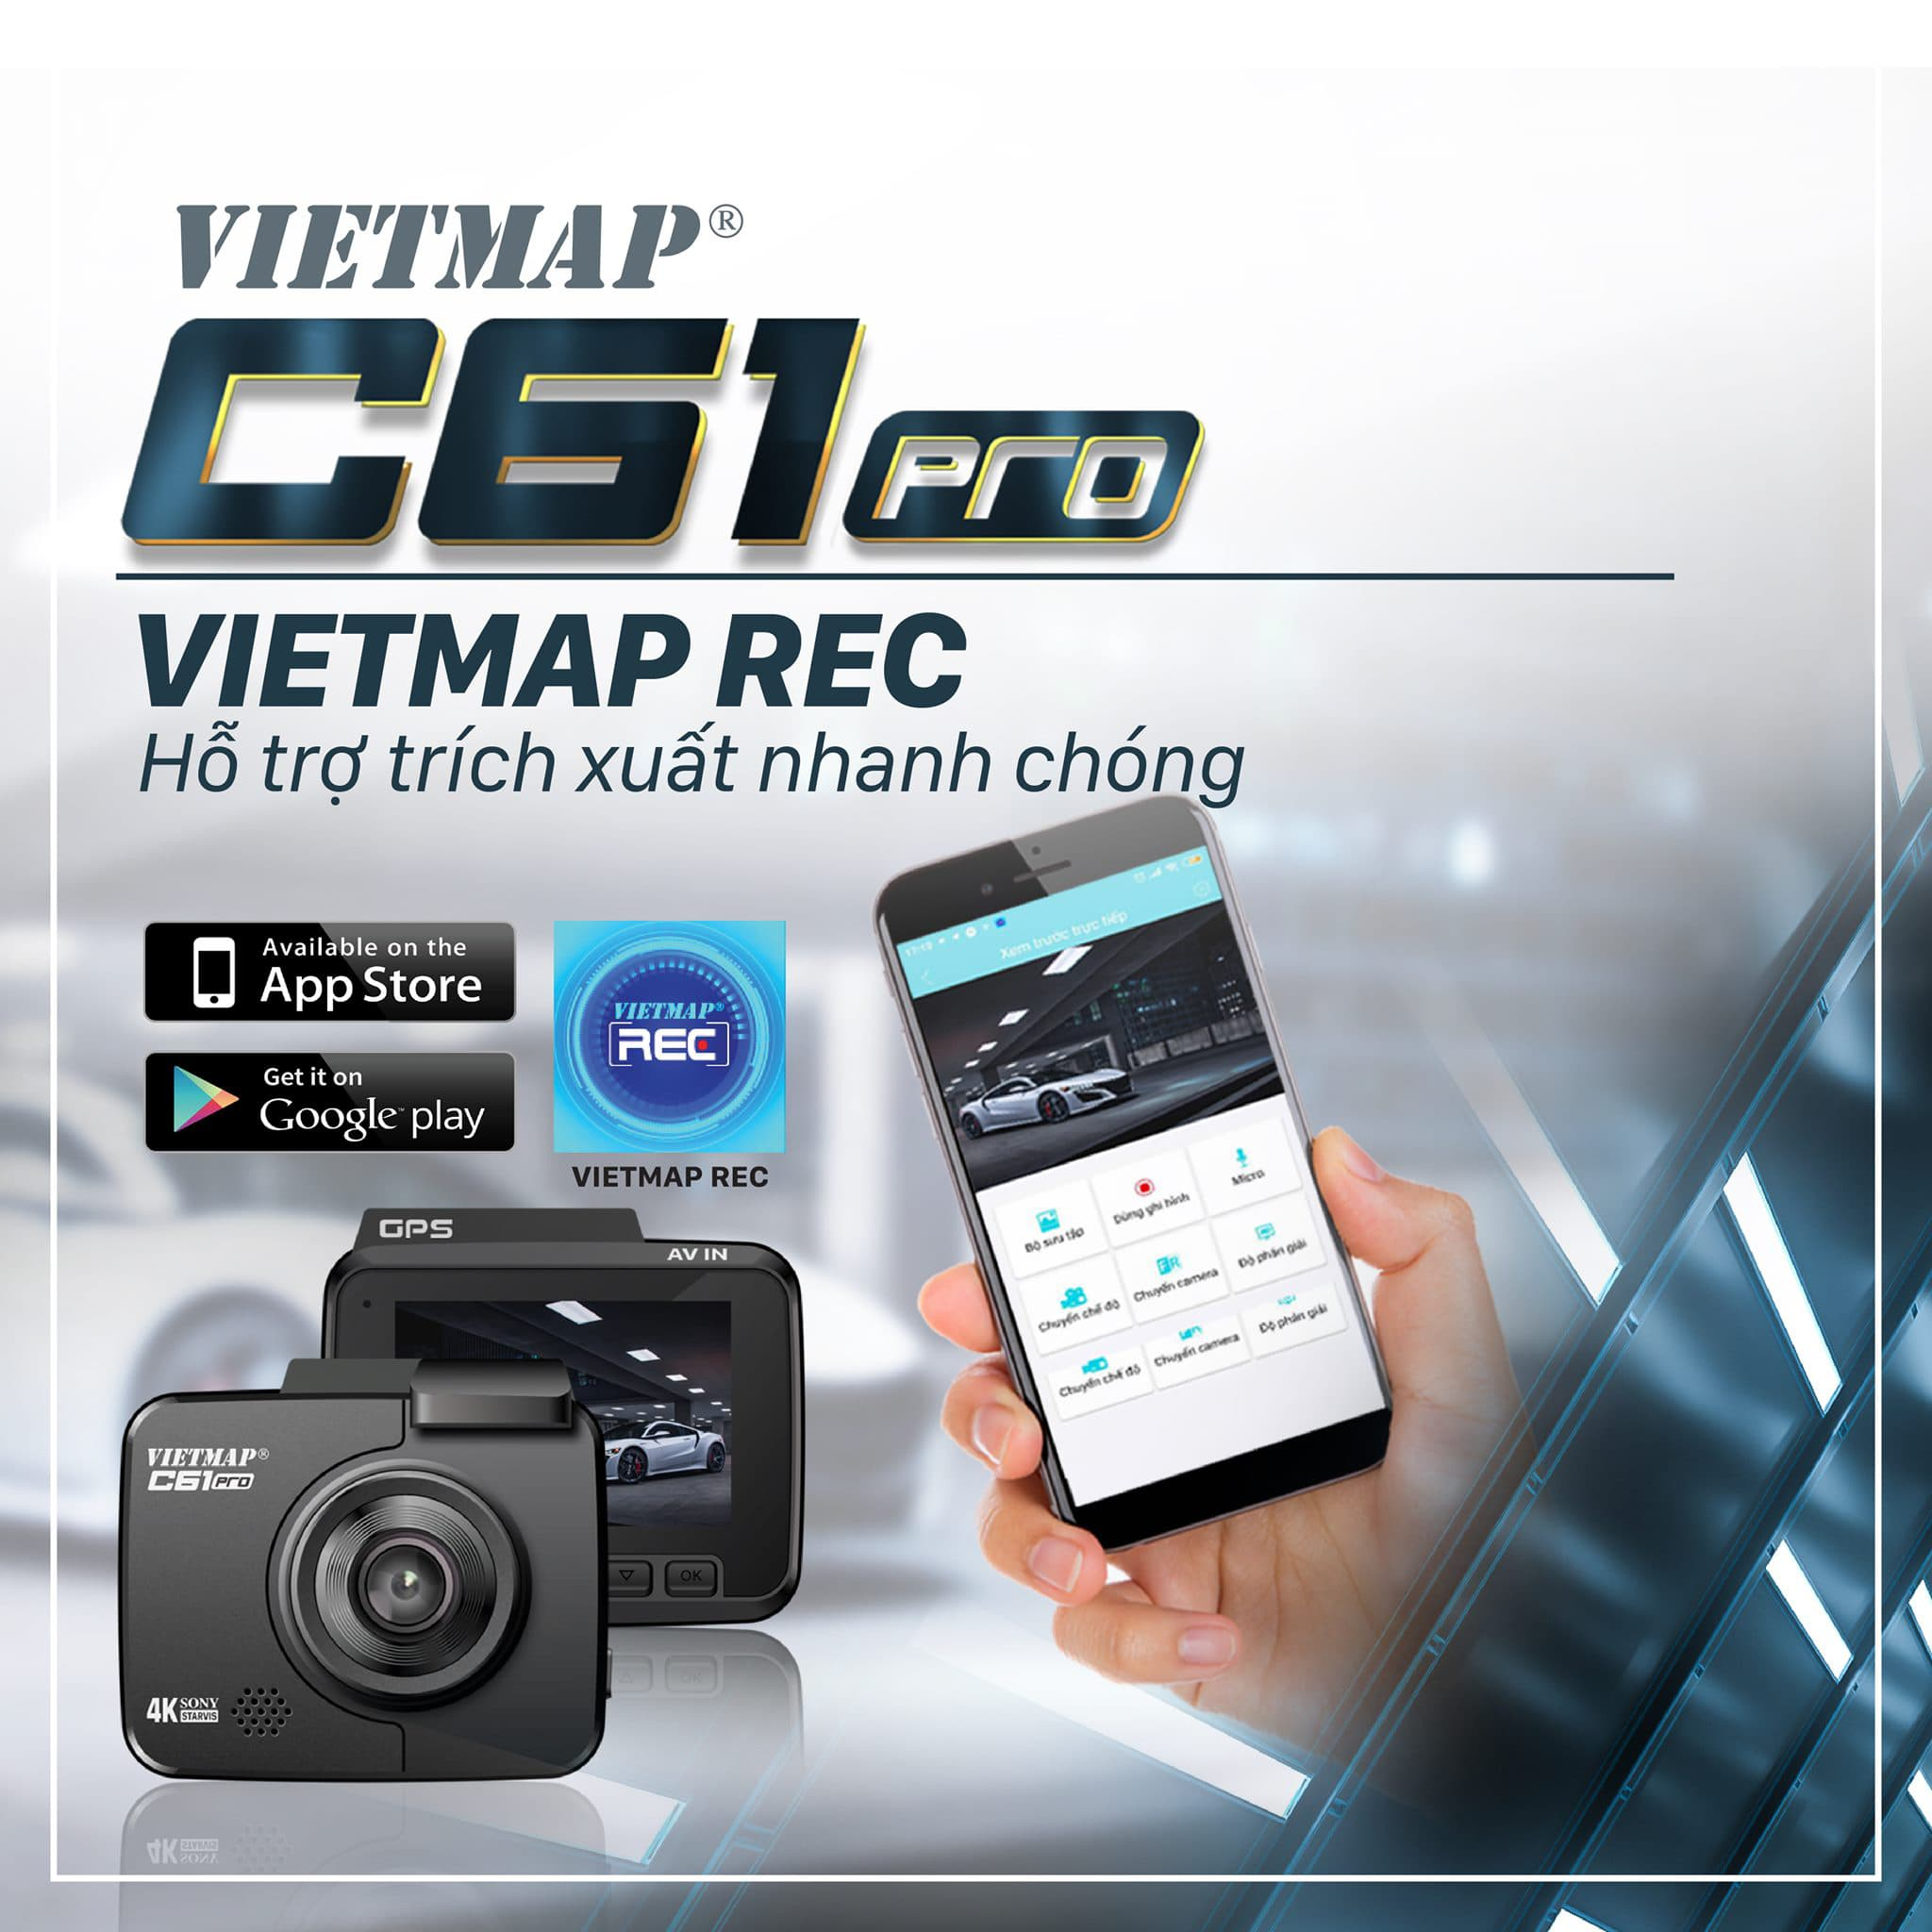 vietmap c61 pro kết nối wifi, gps